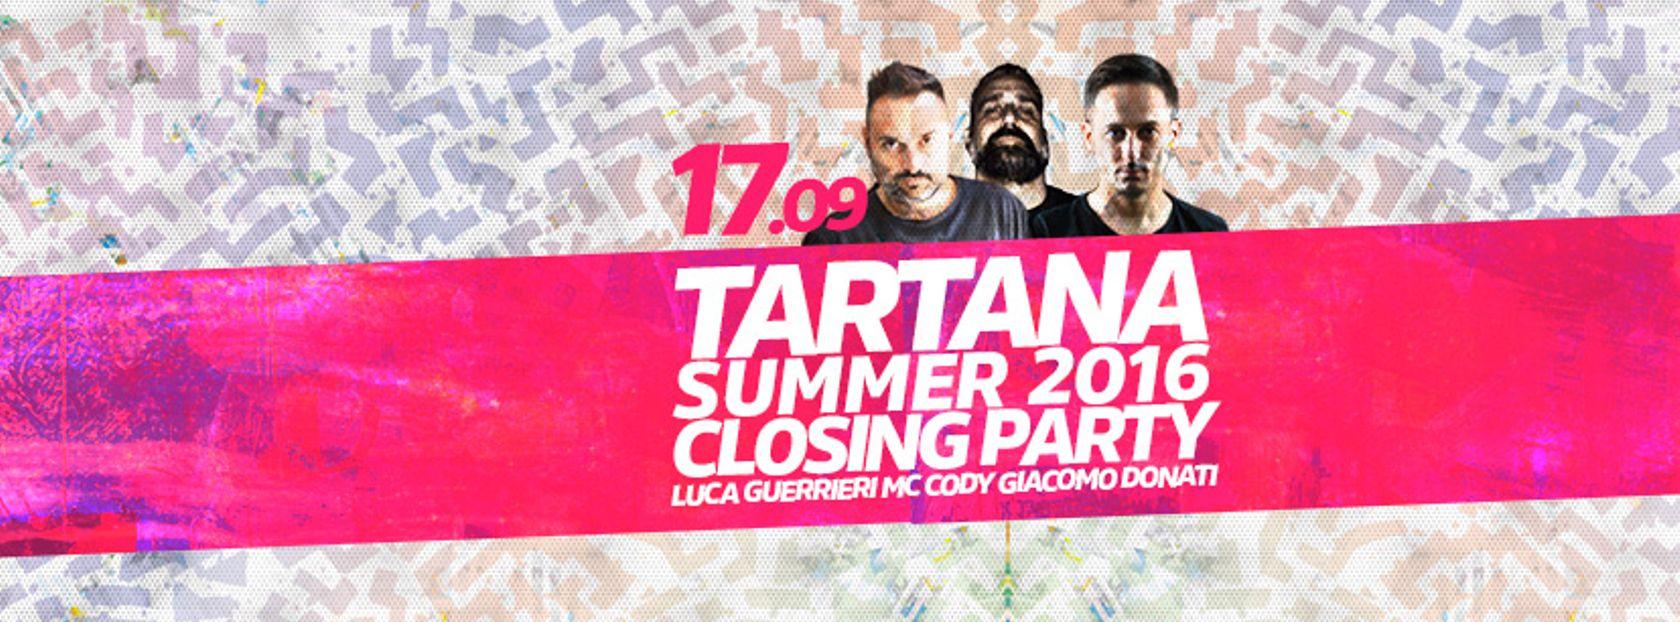 - TARTANA Summer 2016 Closing Party